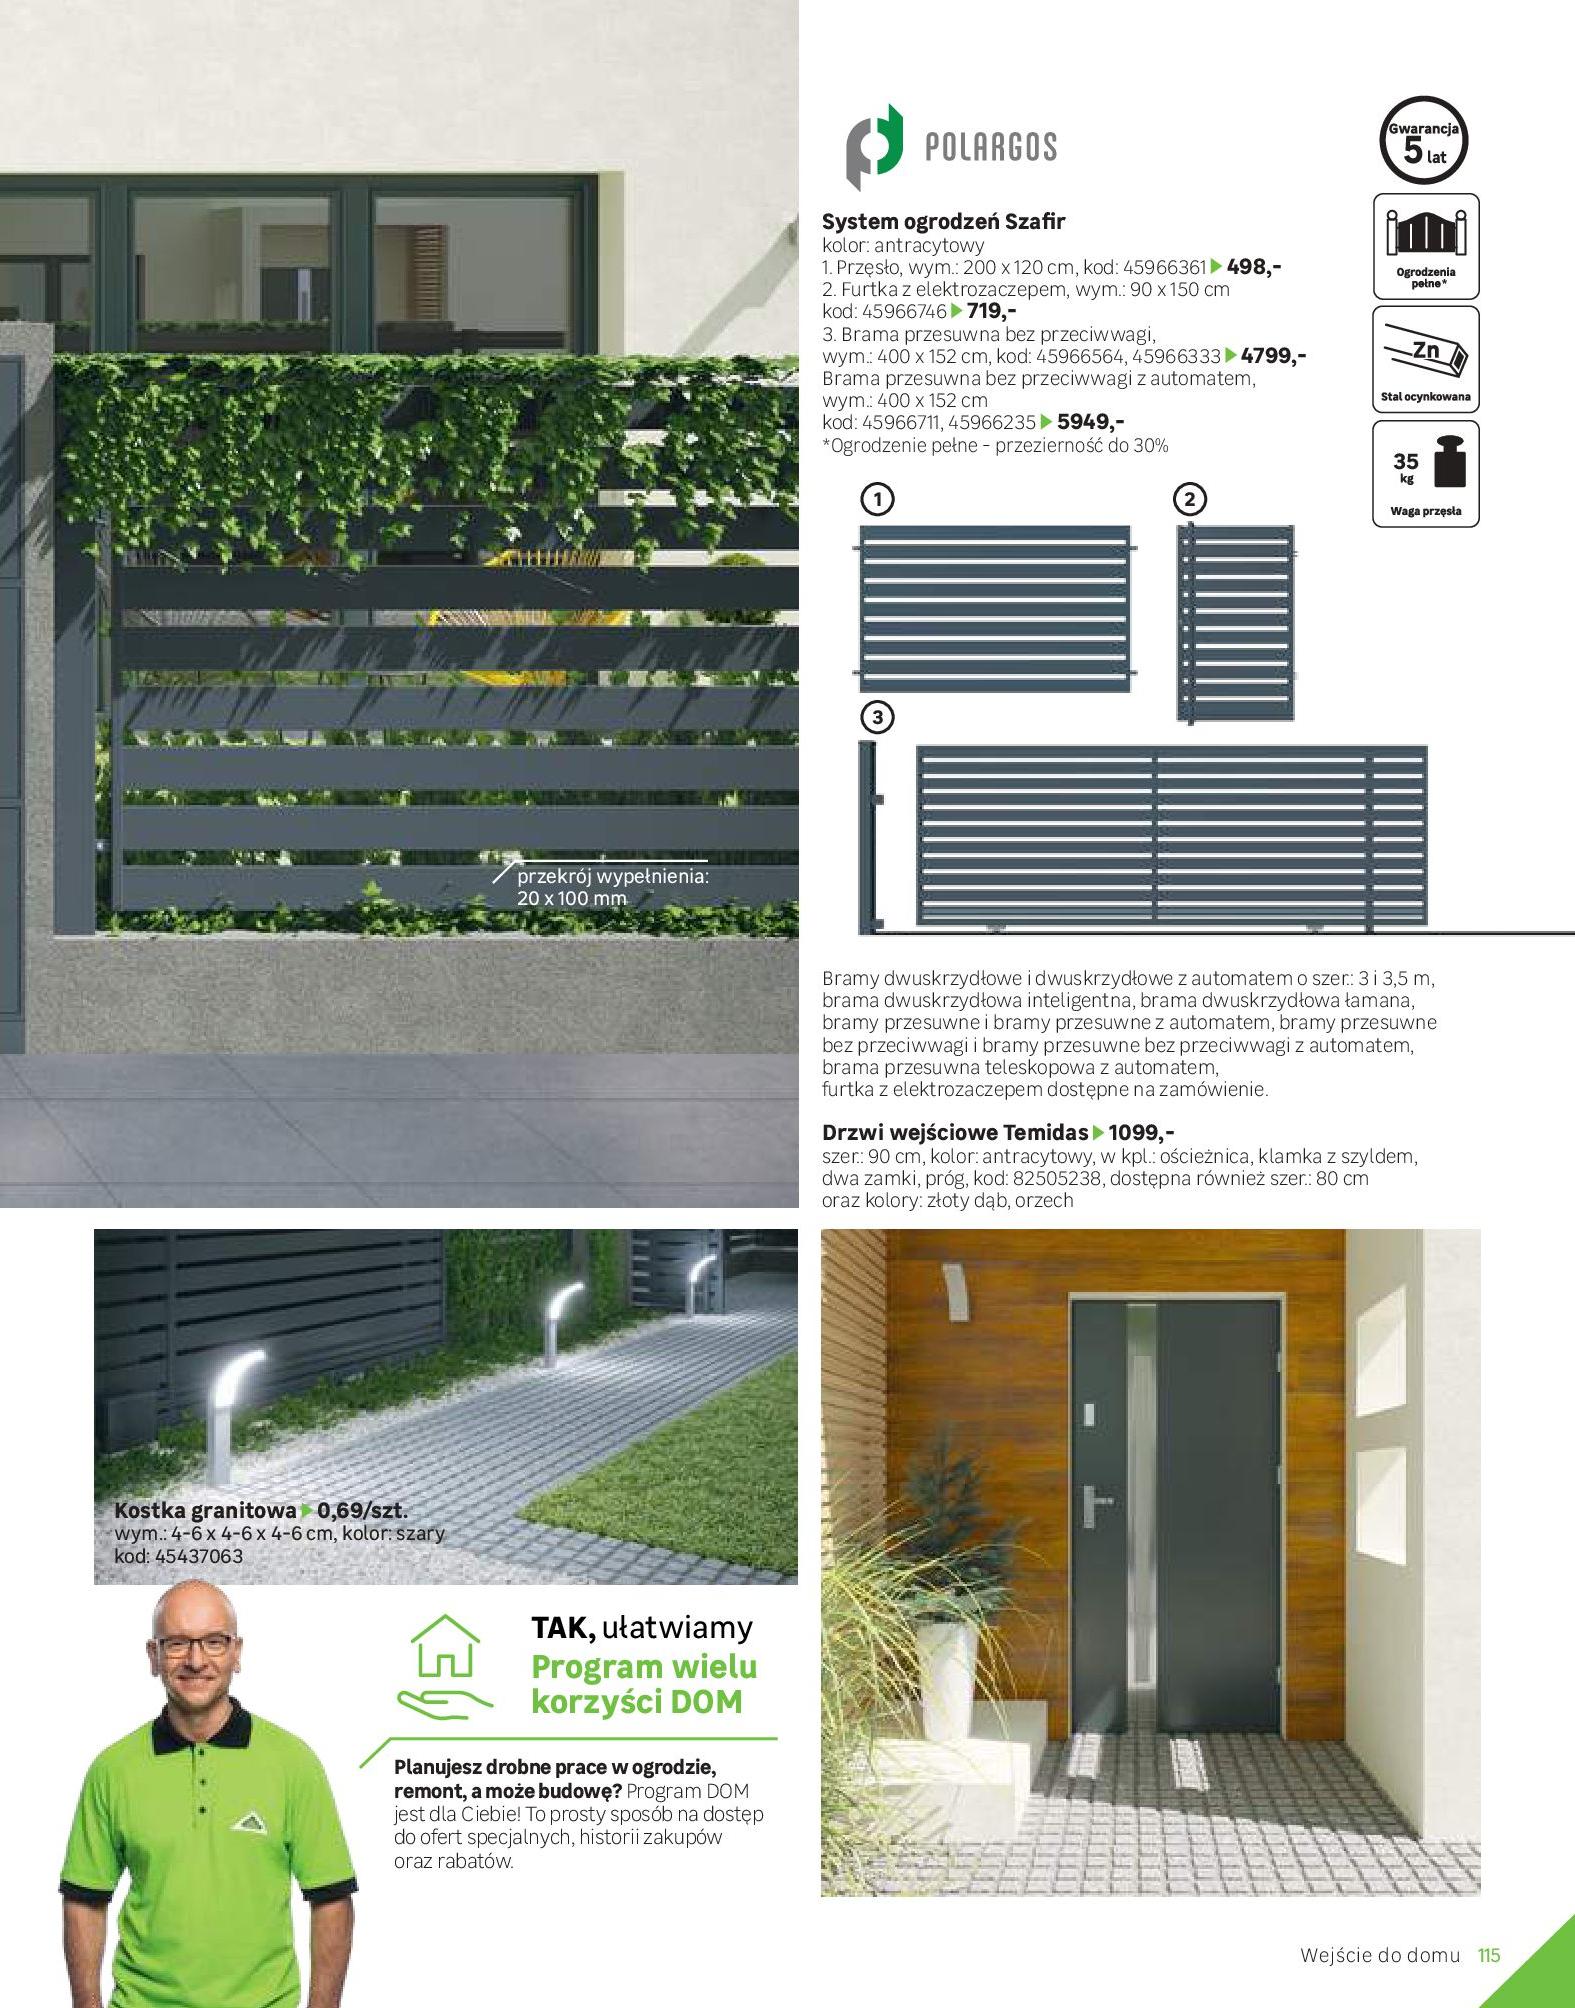 Gazetka Leroy Merlin: Katalog Ogród 2021-03-10 page-115